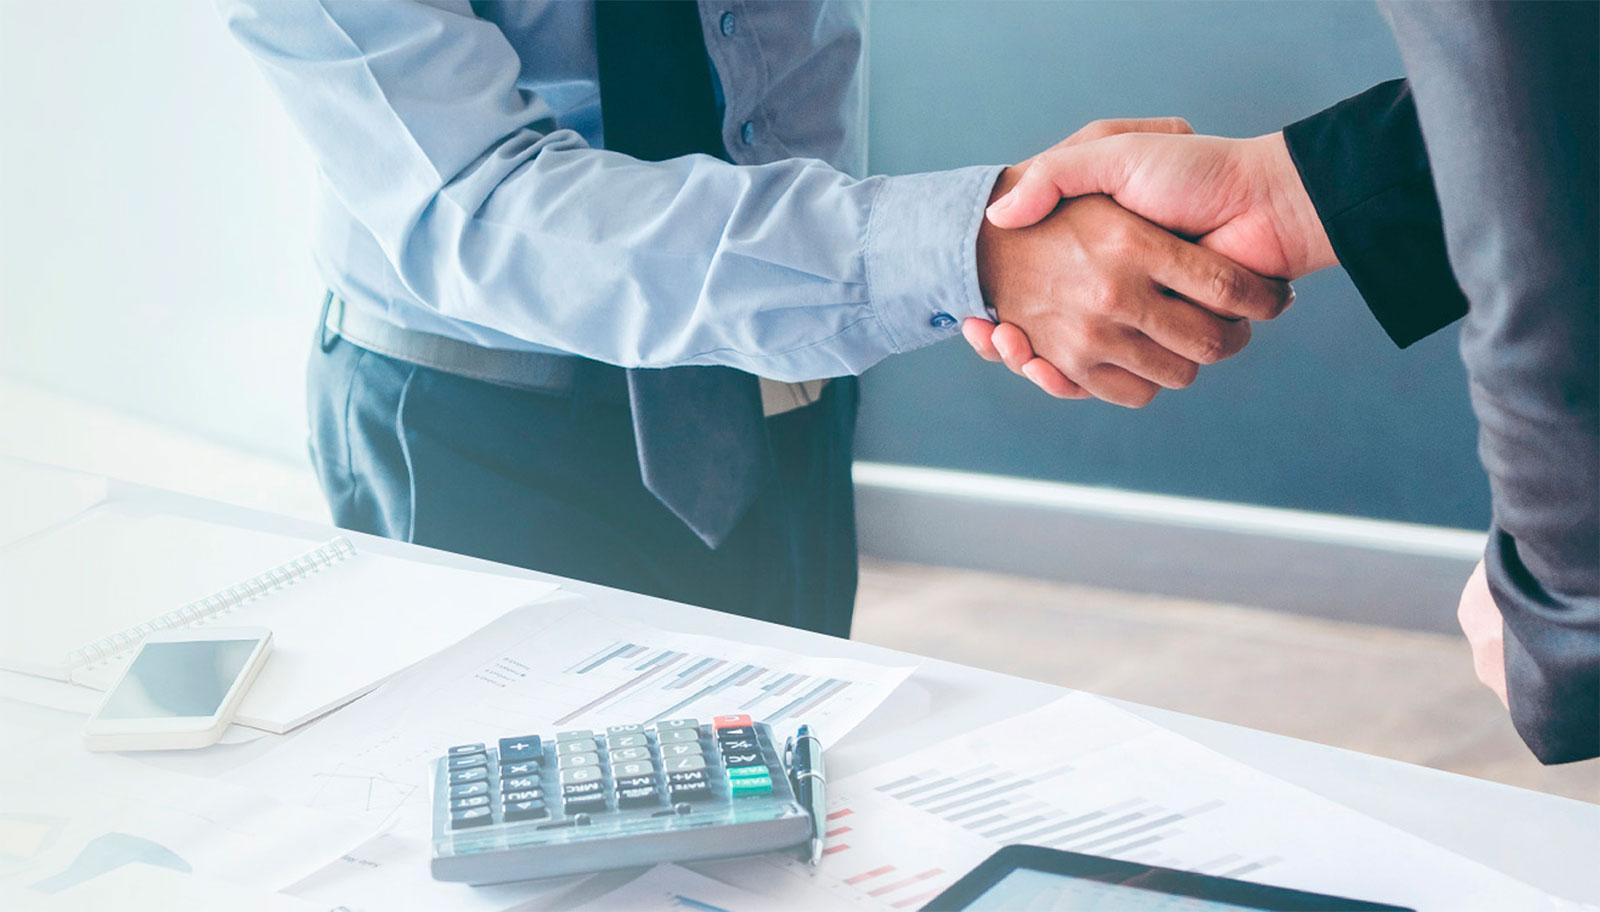 банкротство физлица кредитором